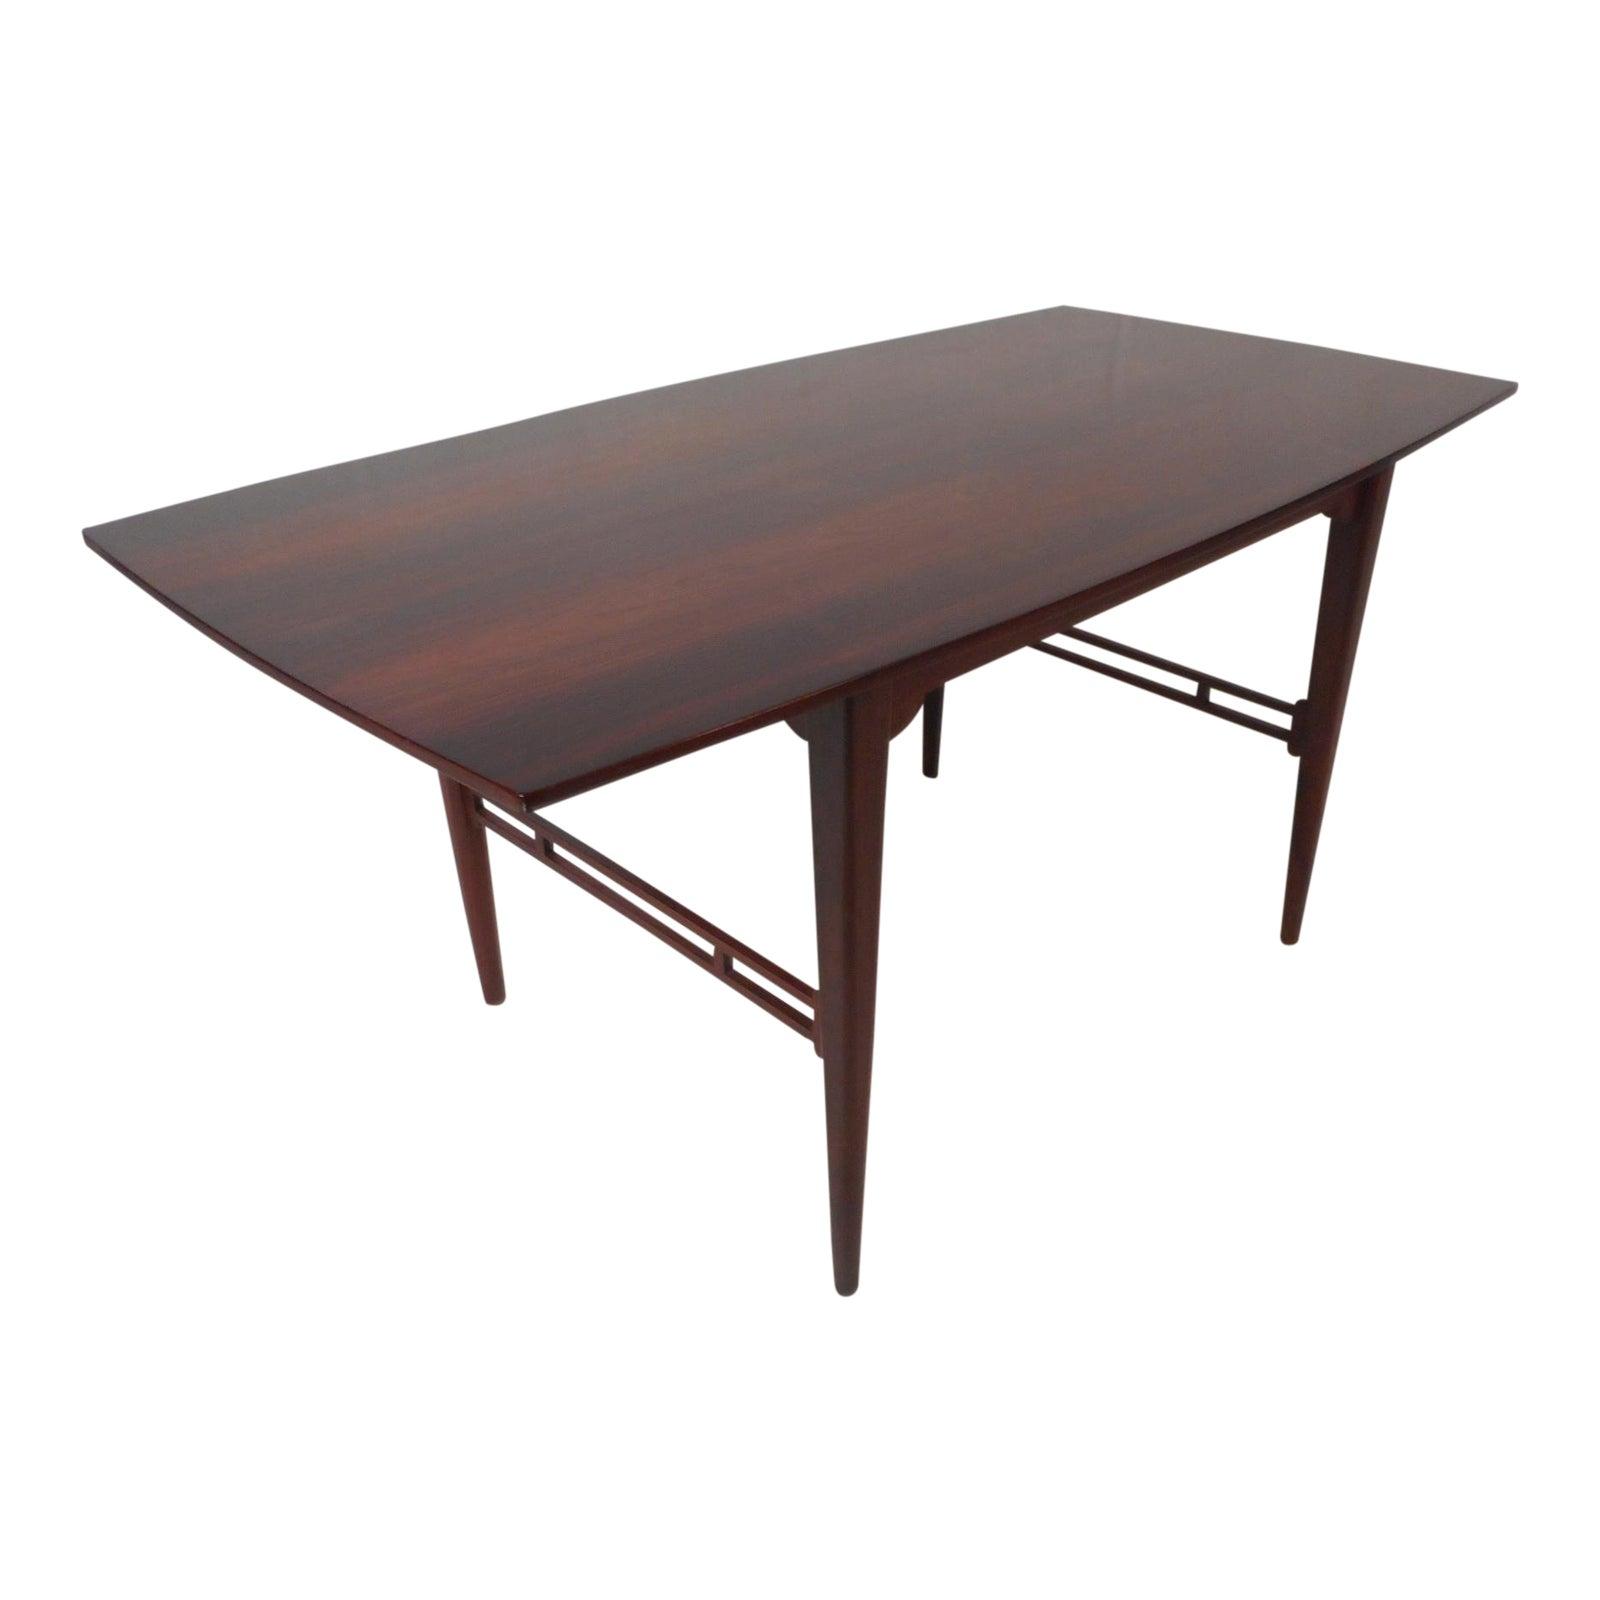 Danish Midcentury Illums Bolighus Rosewood Coffee Table Chairish